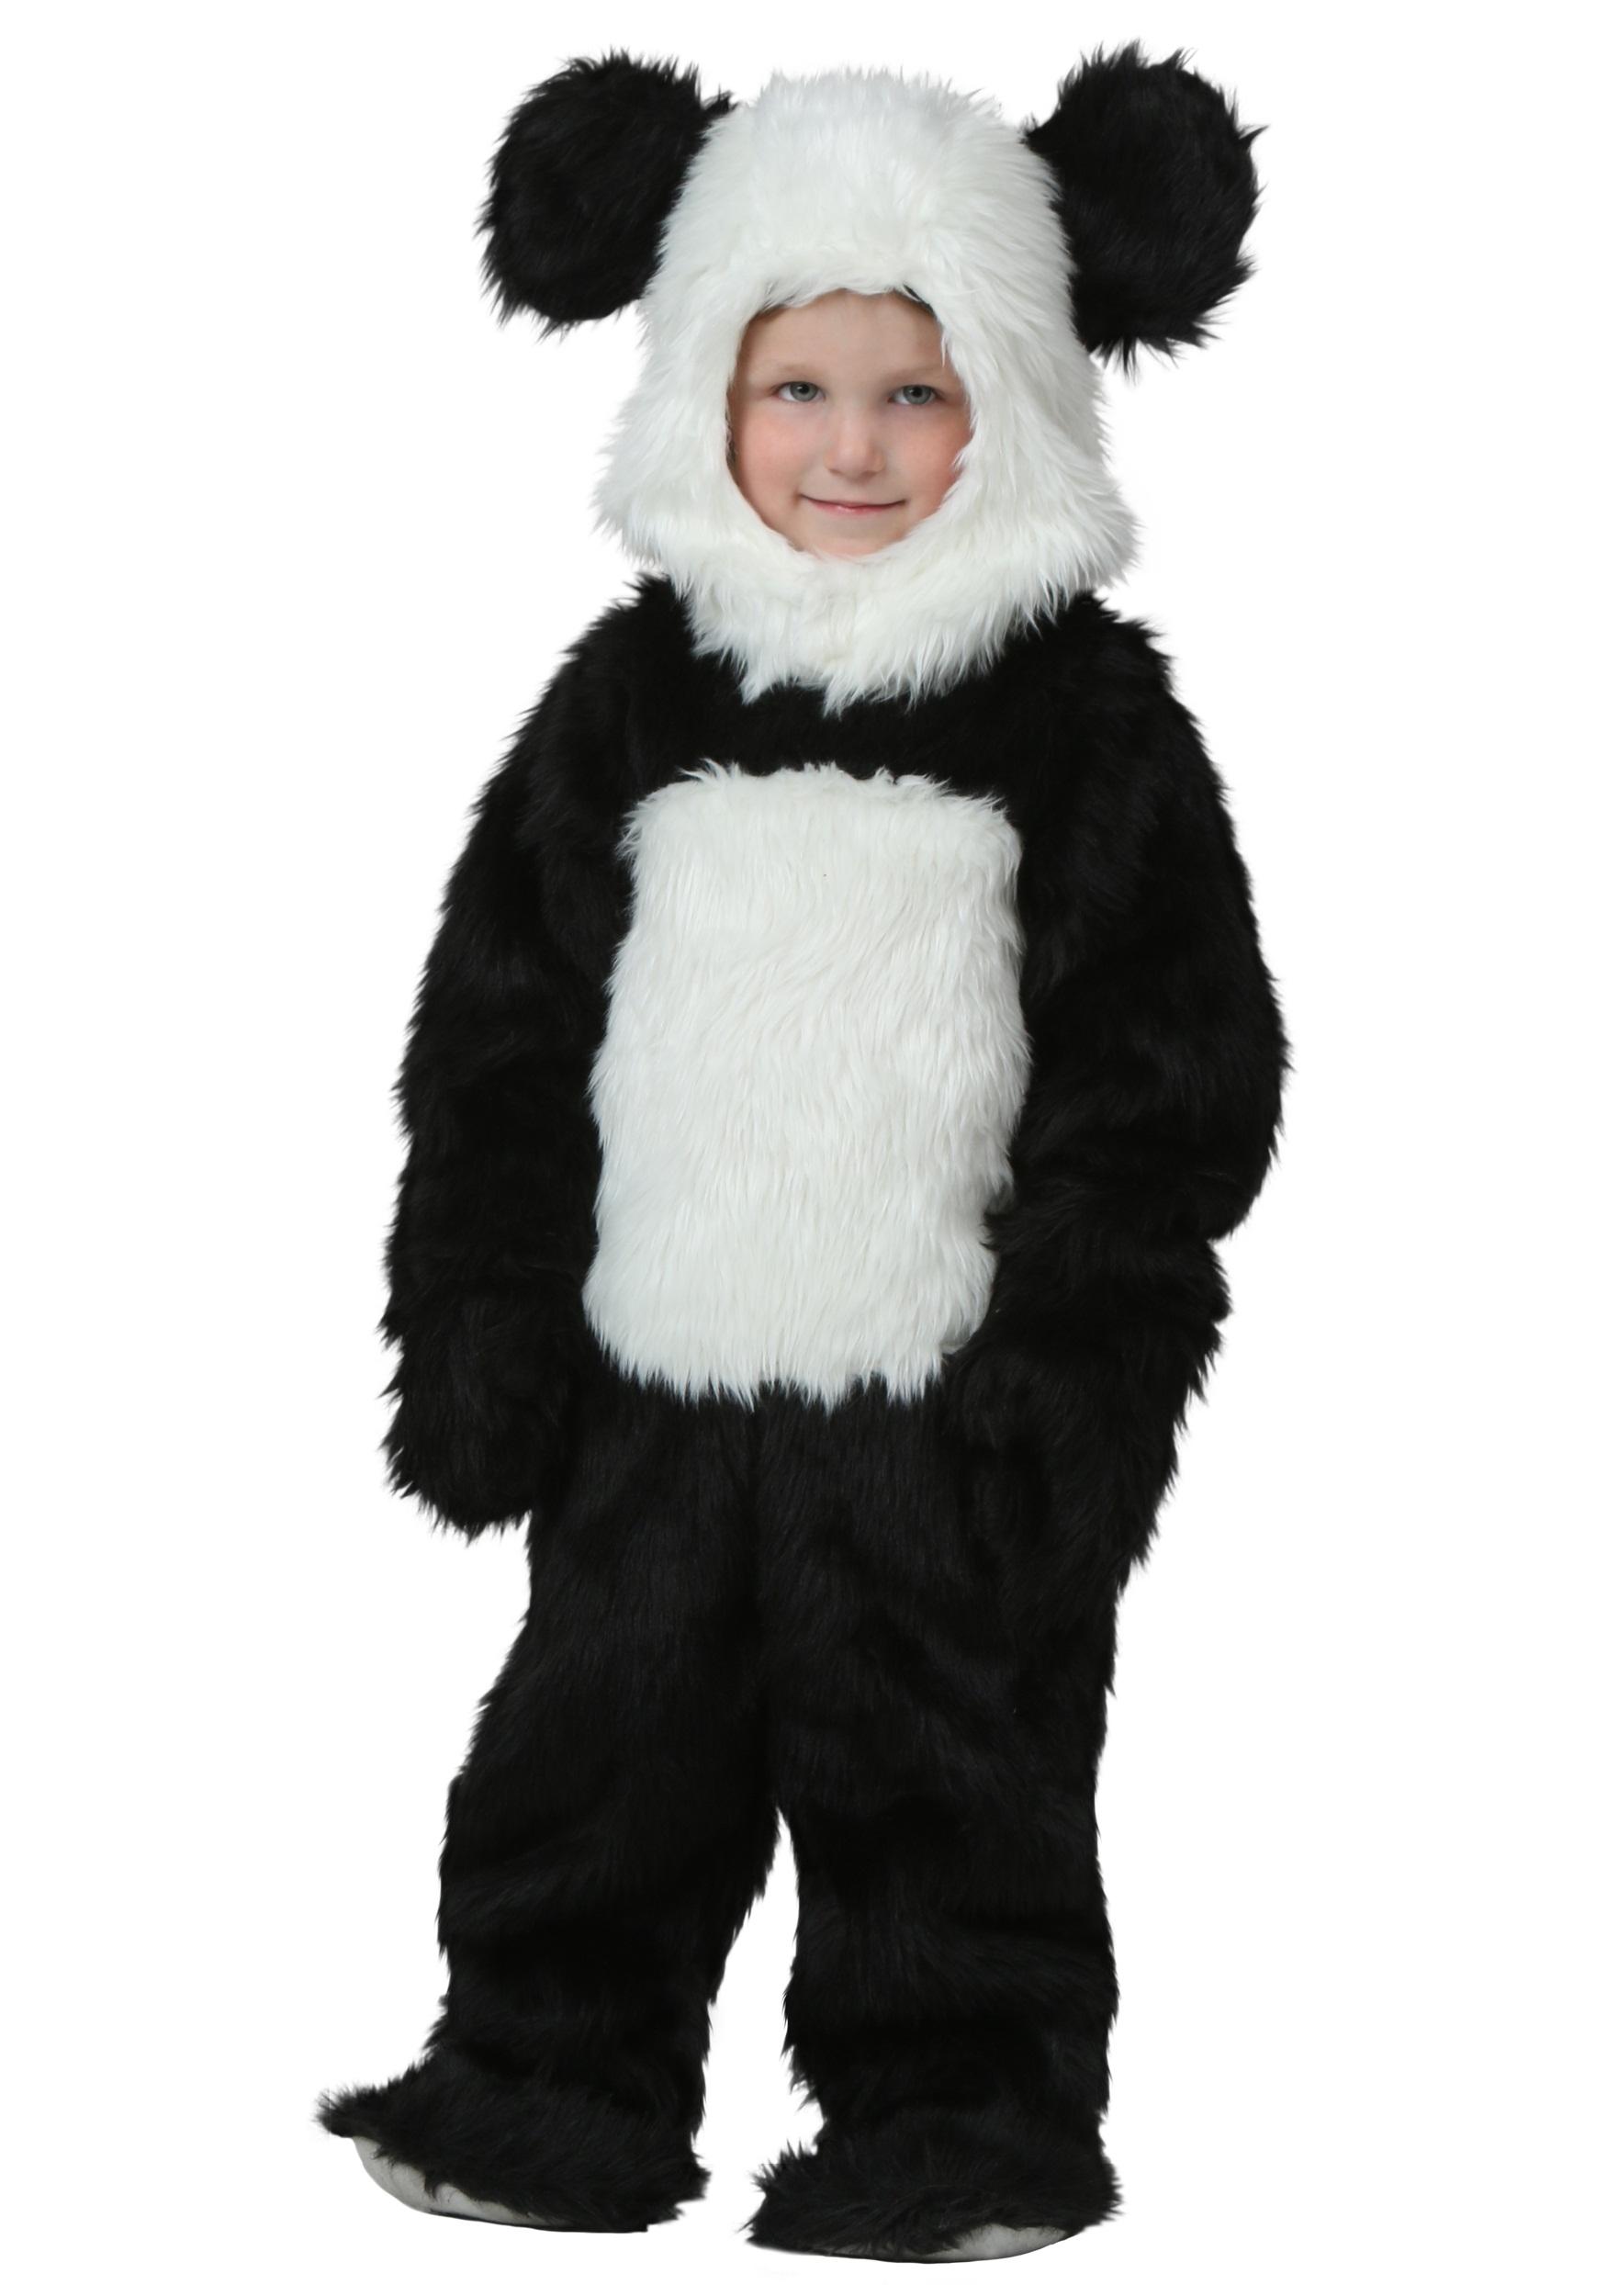 Toddler Deluxe Panda Costume - photo#18